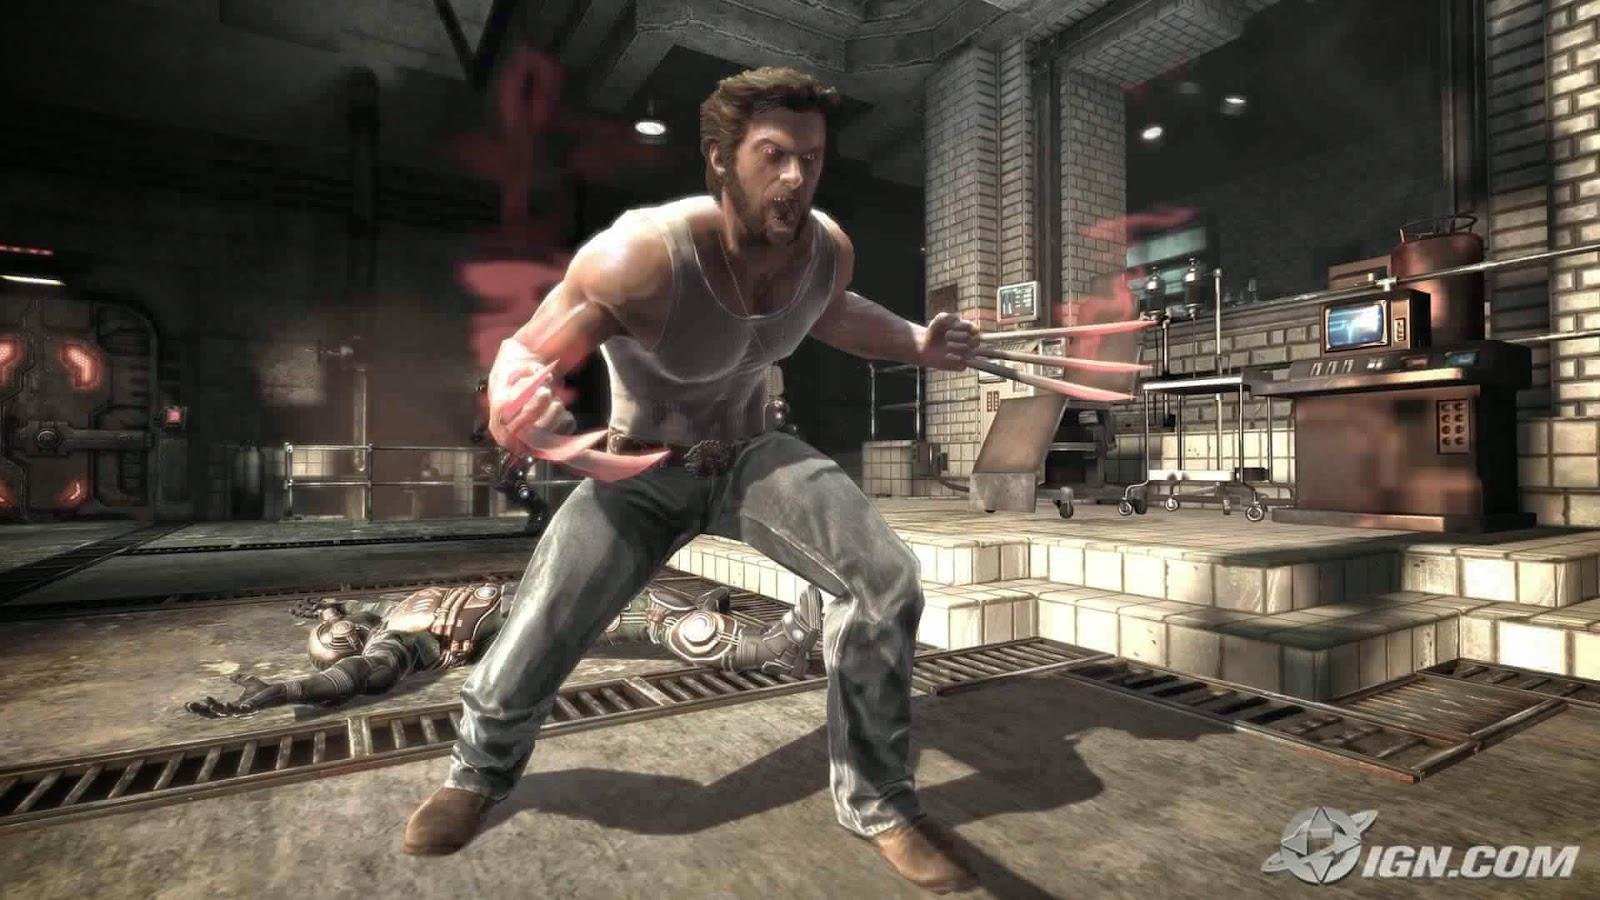 X-Men Origins Wolverine Game - Pcgamecloud